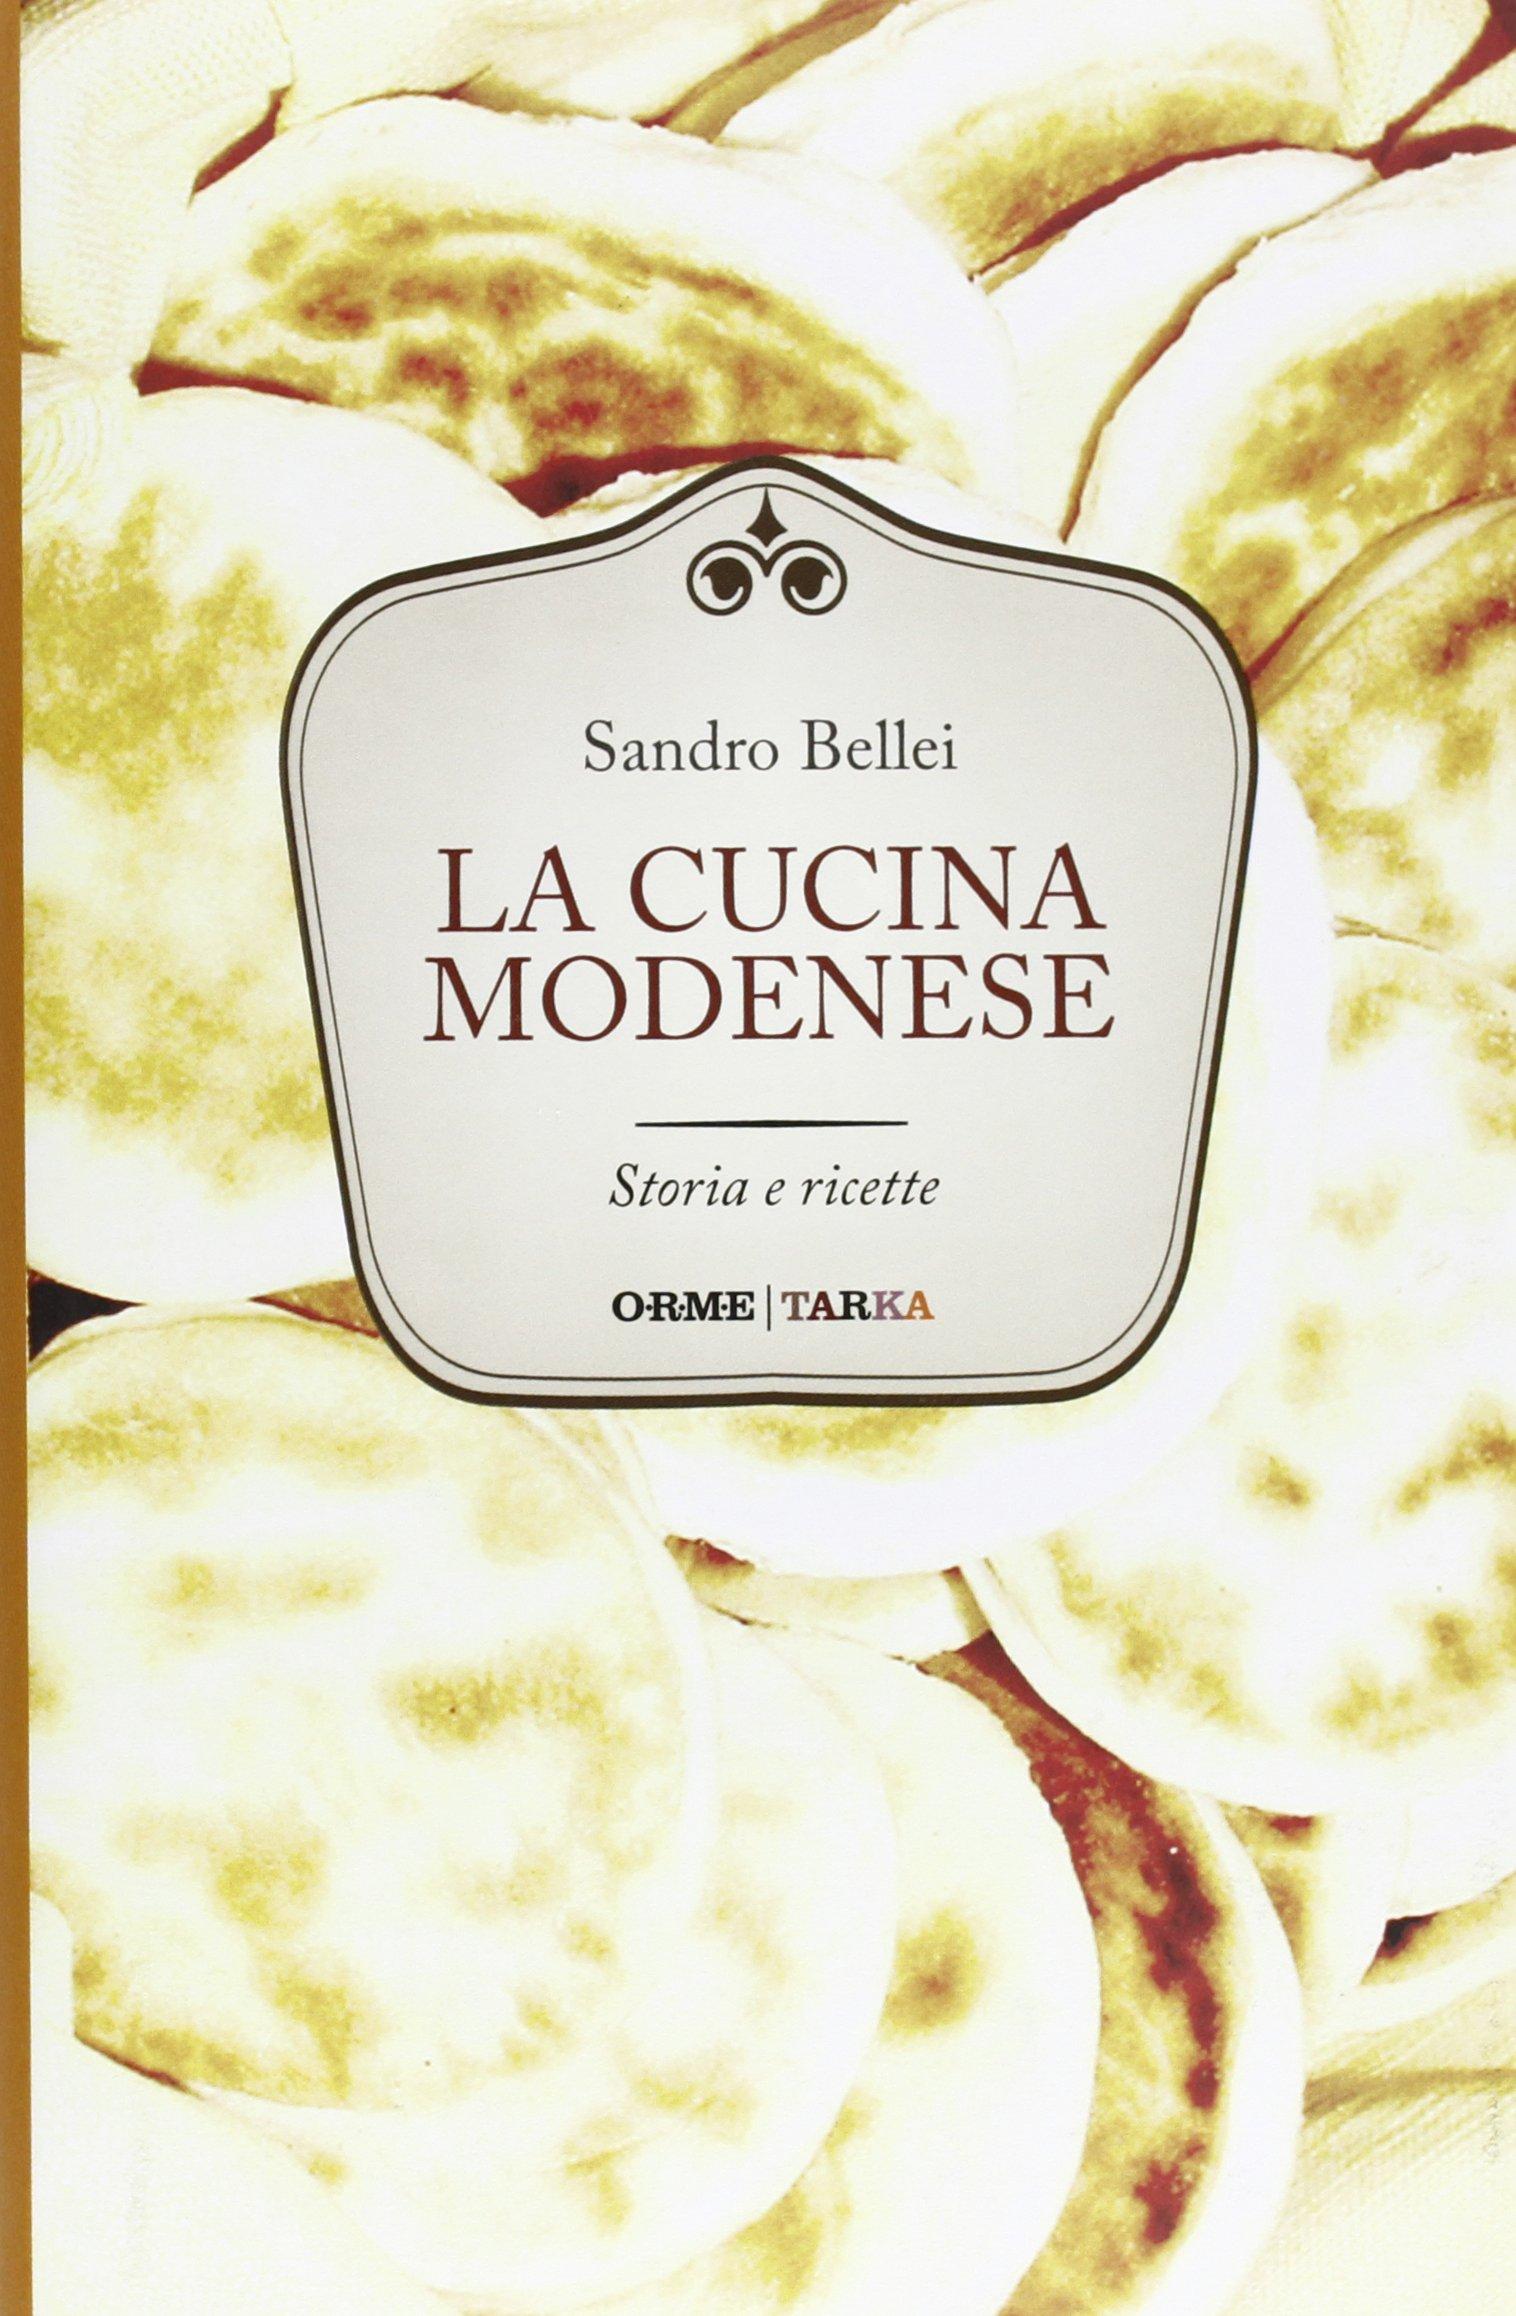 La cucina modenese. Storia e ricette: Amazon.de: Sandro Bellei: Bücher